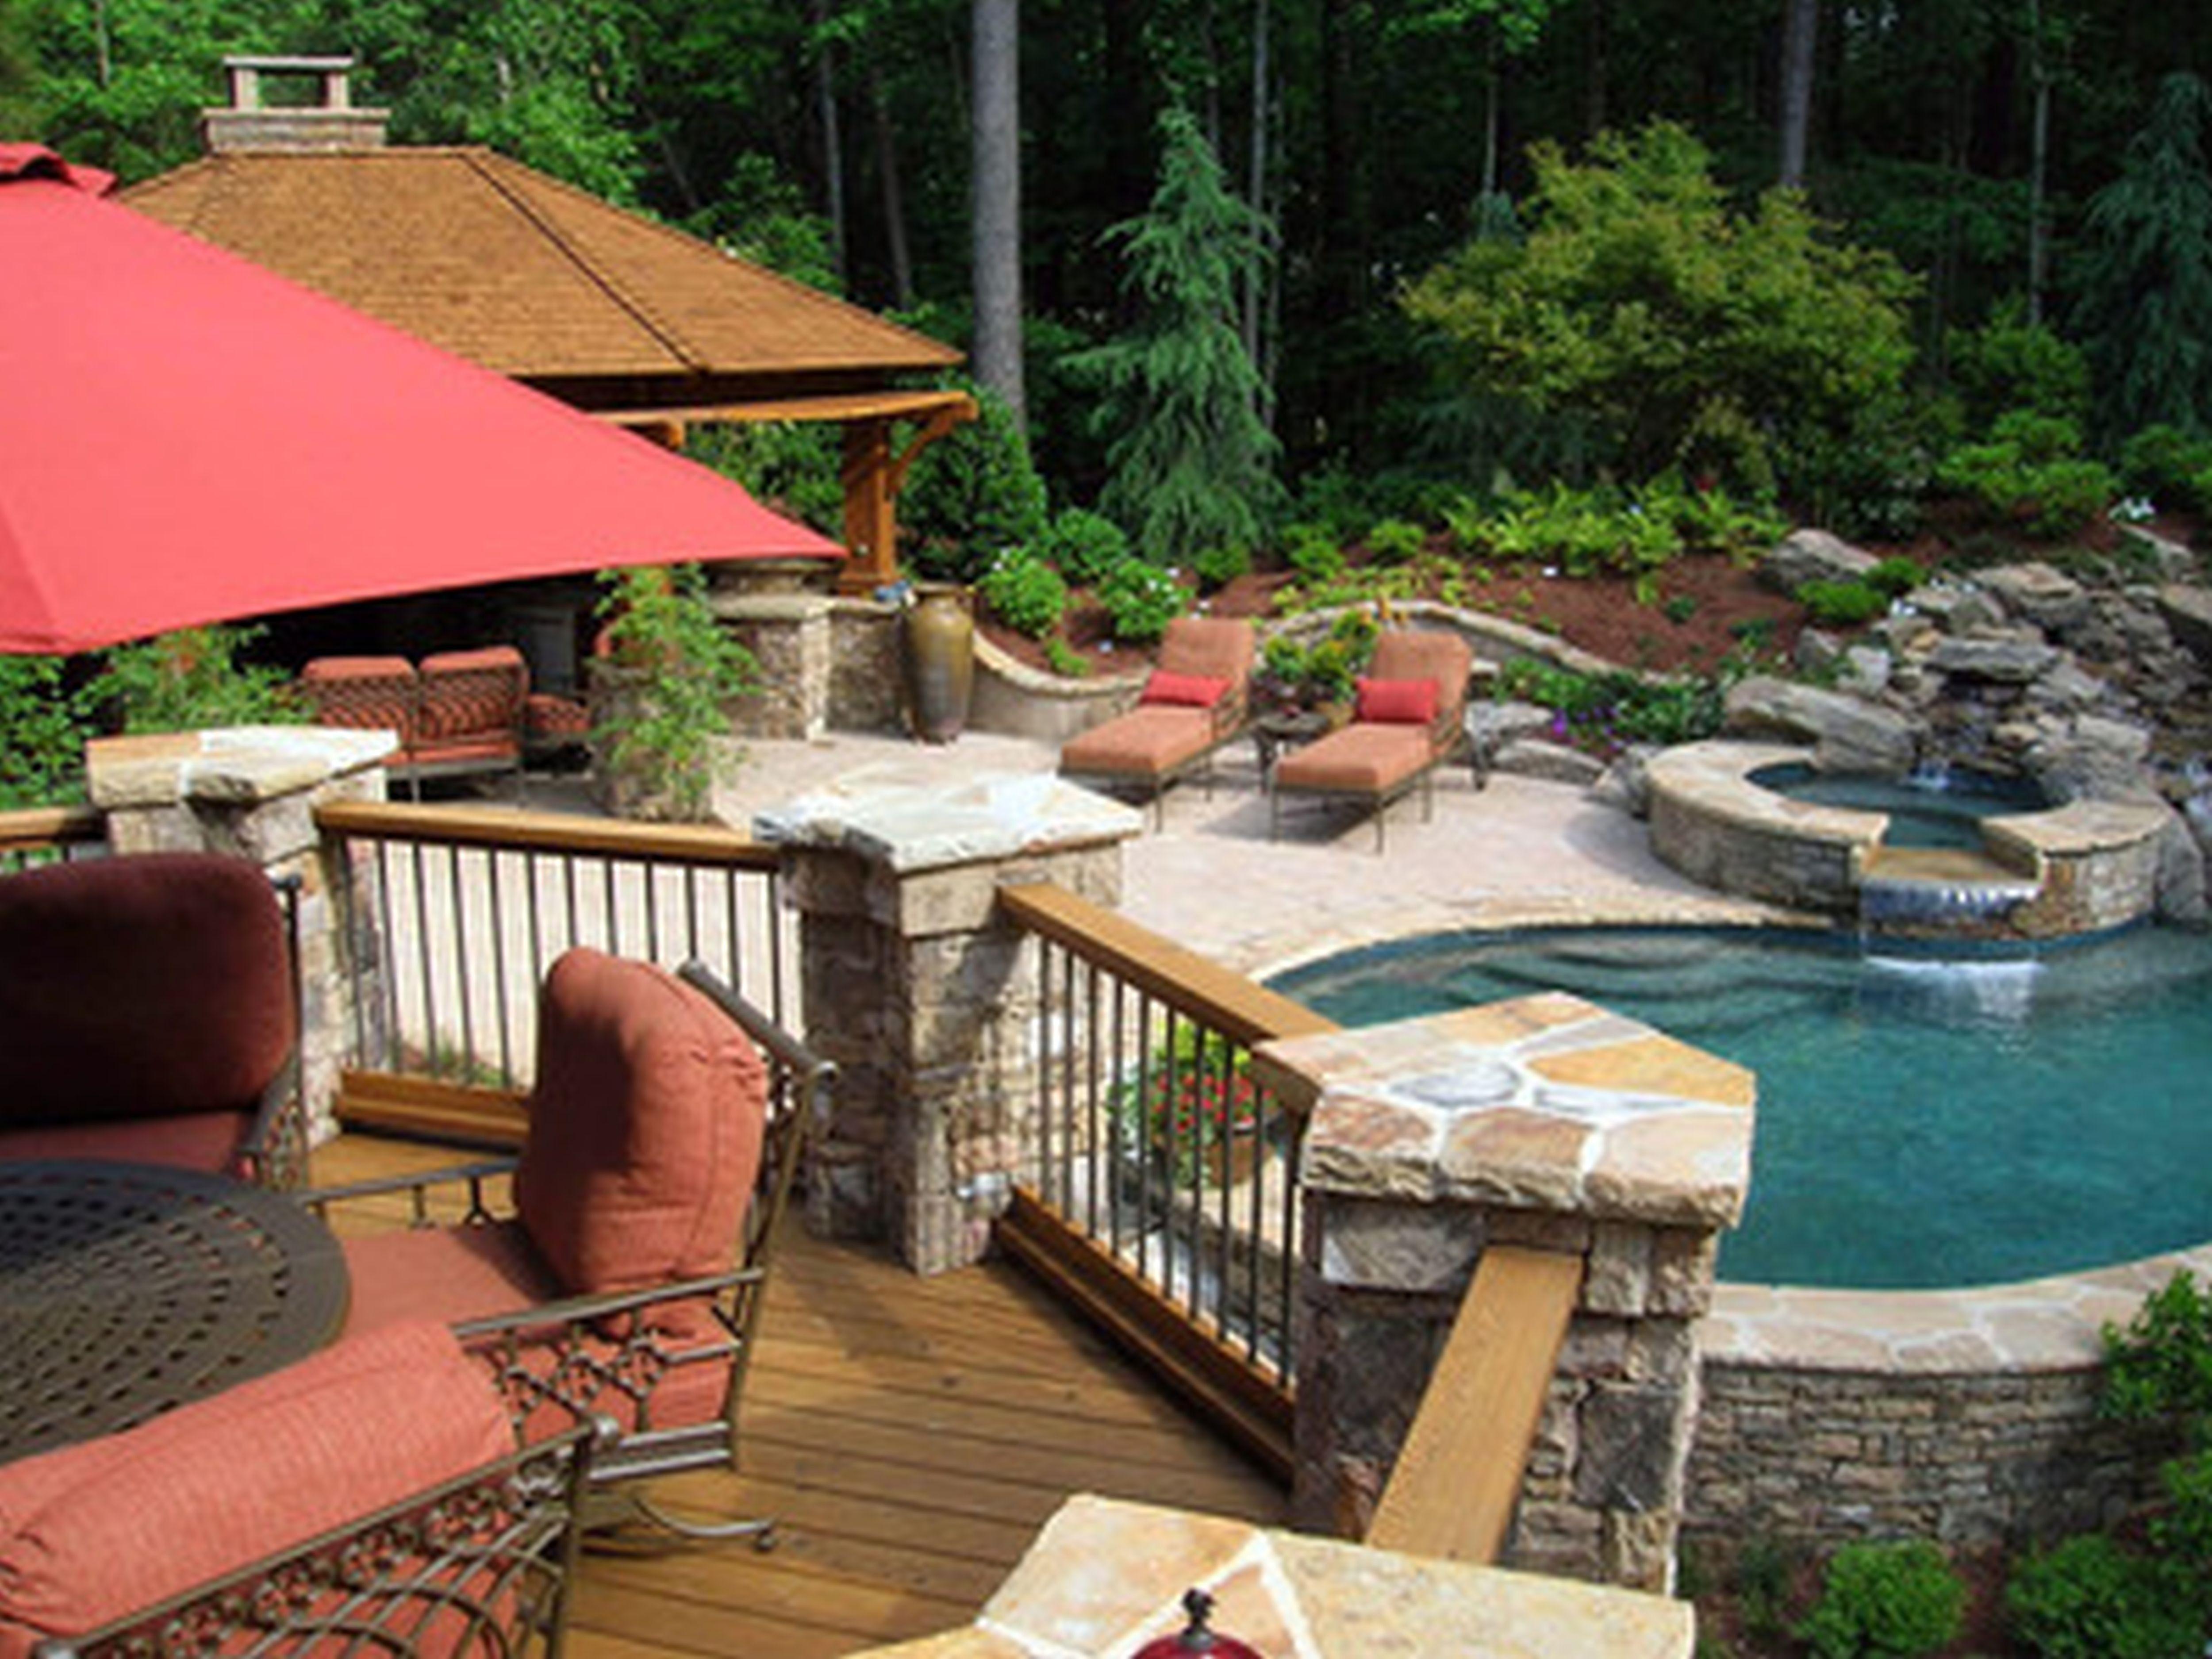 Backyard ideas outdoor tv speakers backyard tv speakers diy pool nj design